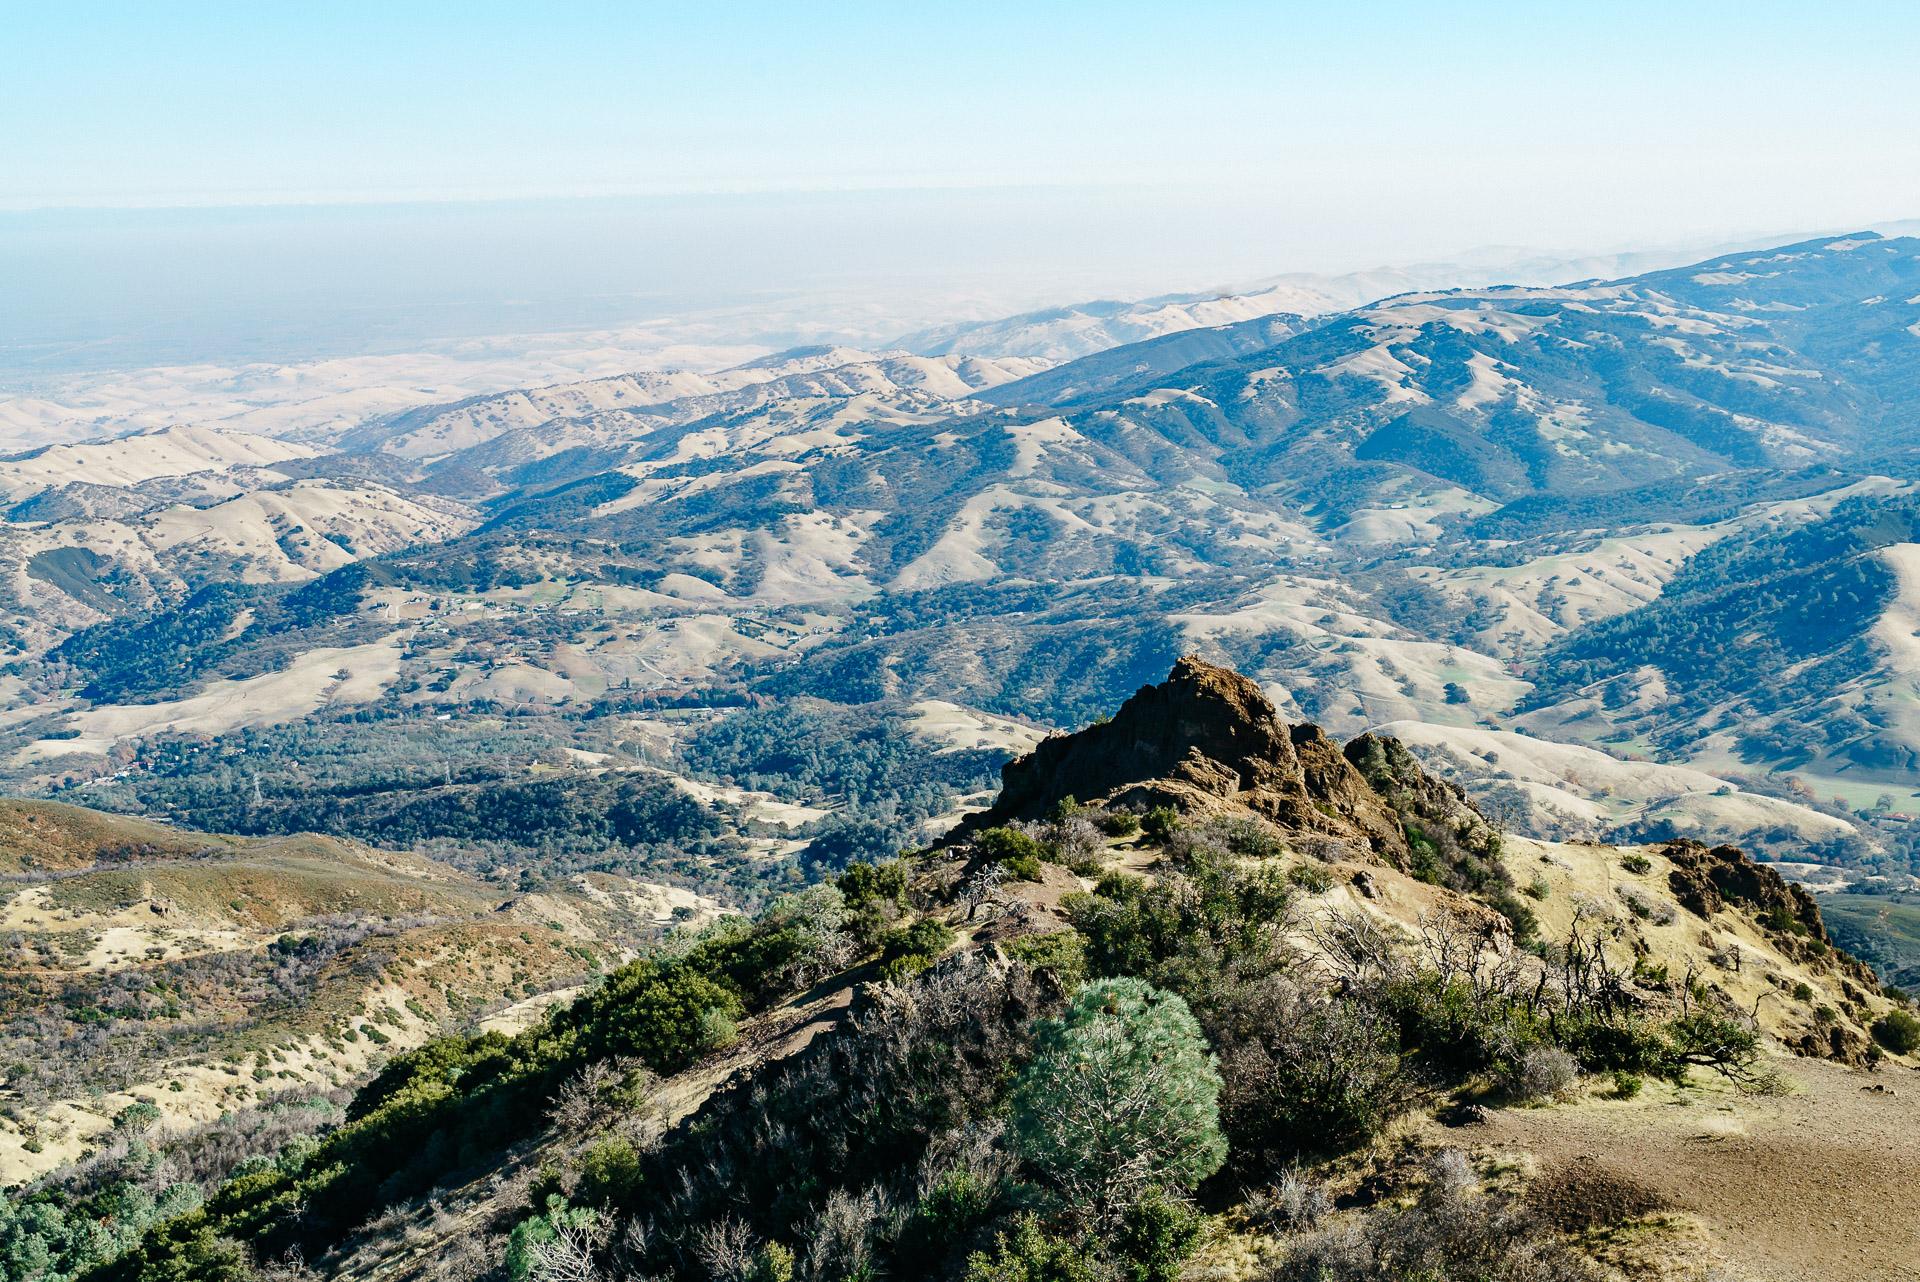 Image from Mount Diablo SP